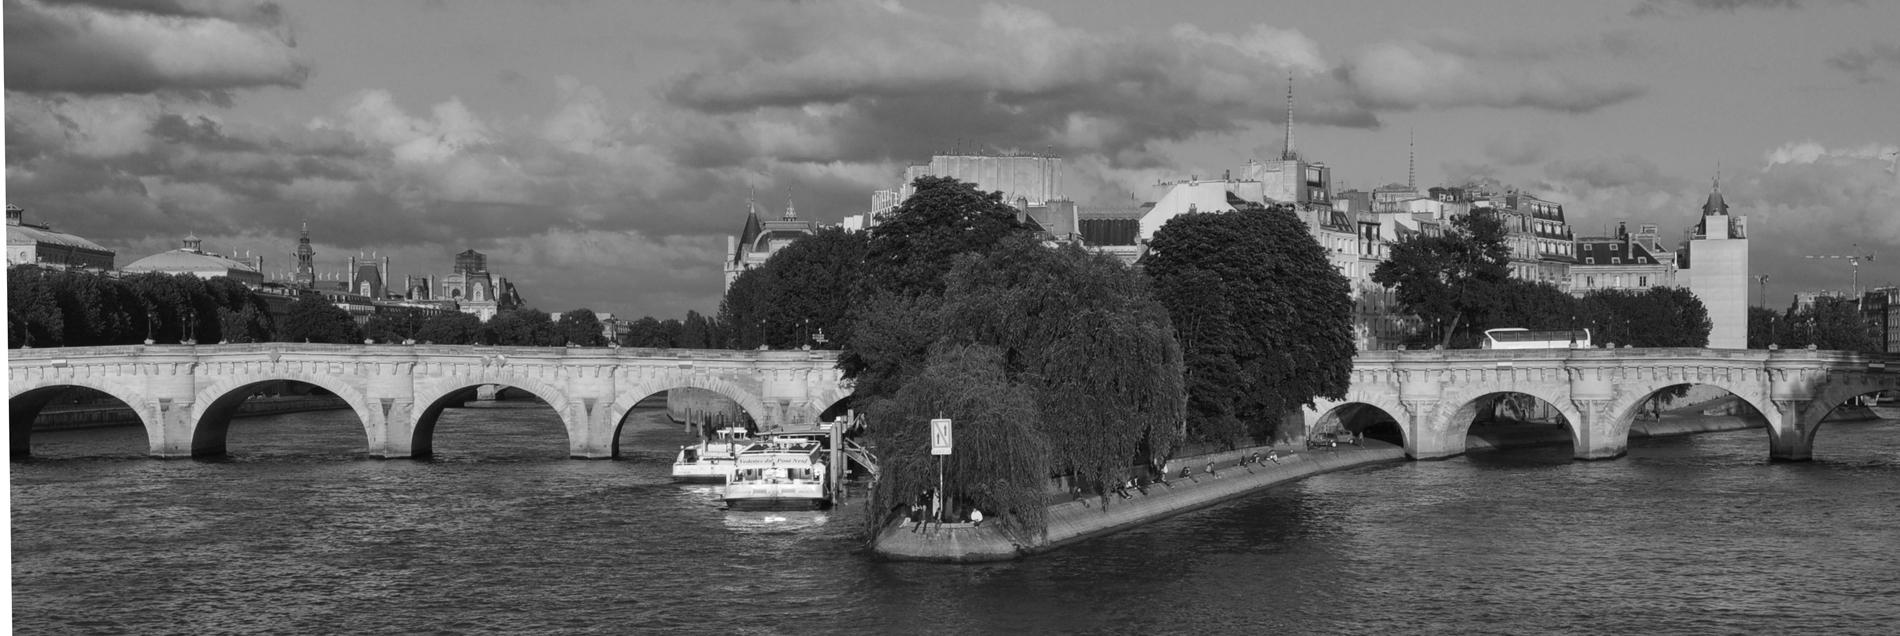 paris - פריז סיפור אהבה - יואל שתרוג - אדמה יוצרת - yoel sitruk